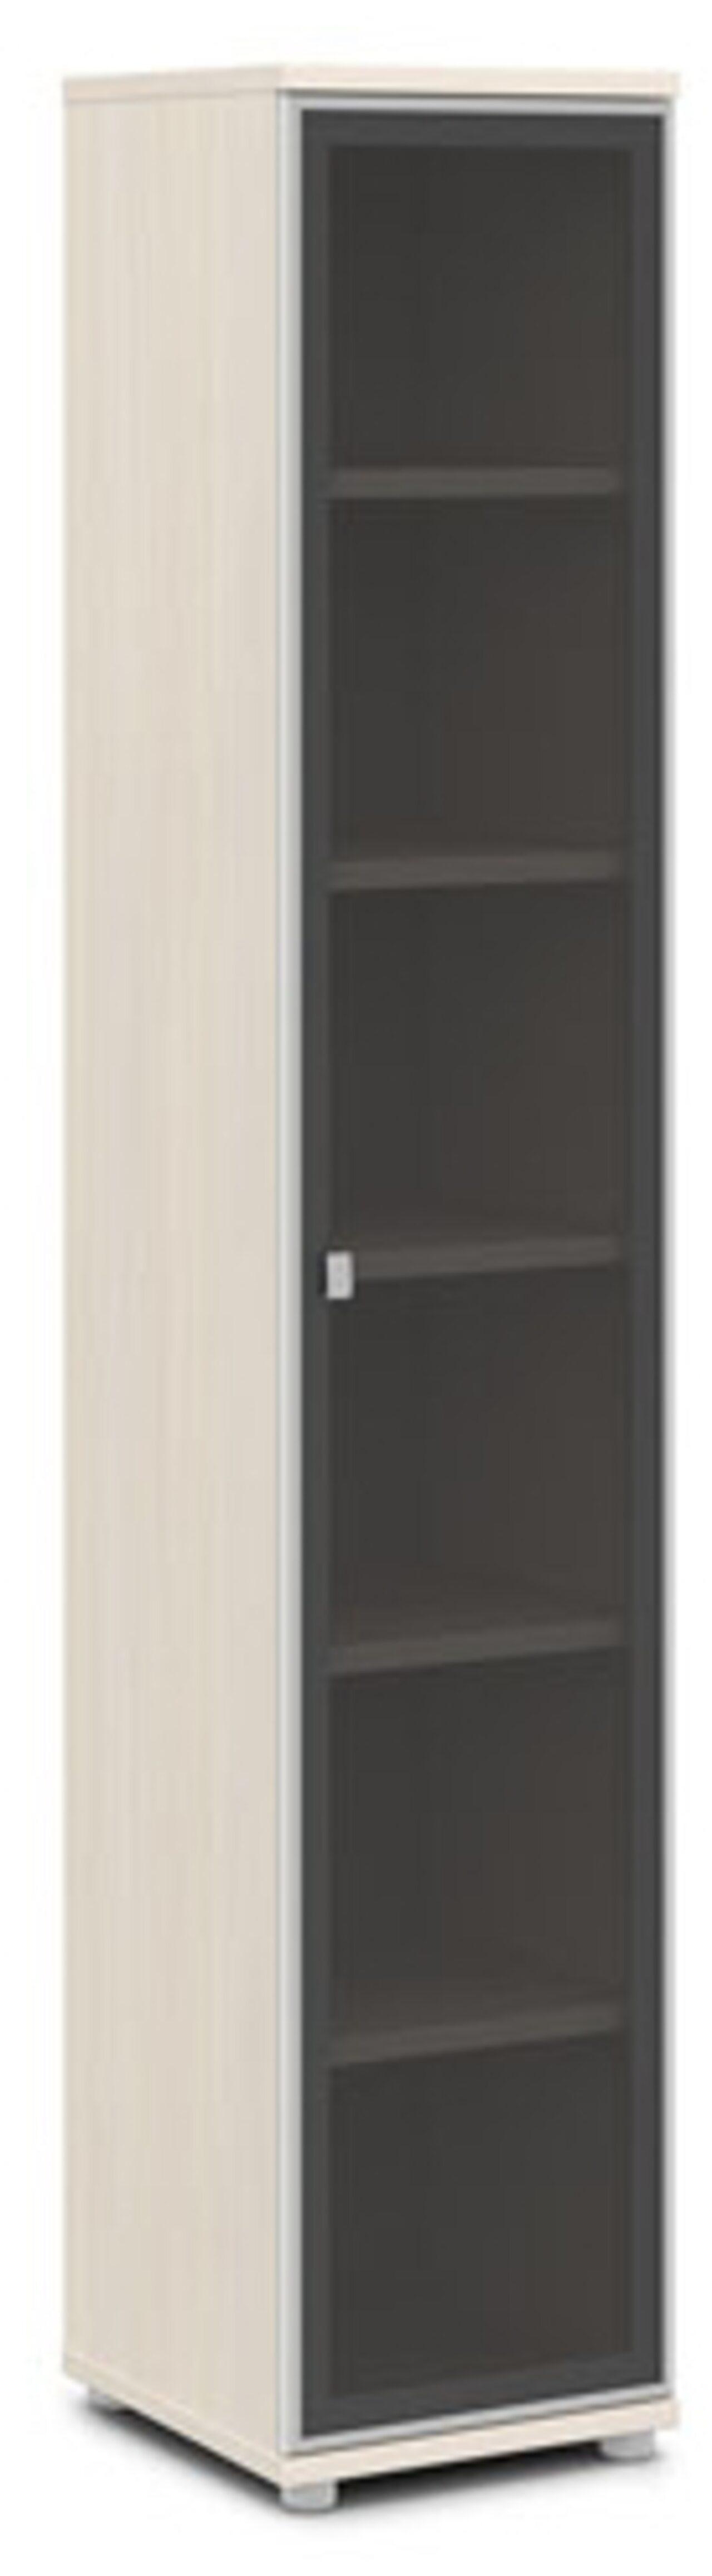 Шкаф со стеклом в алюминиевом профиле  Vasanta 42x44x220 - фото 7